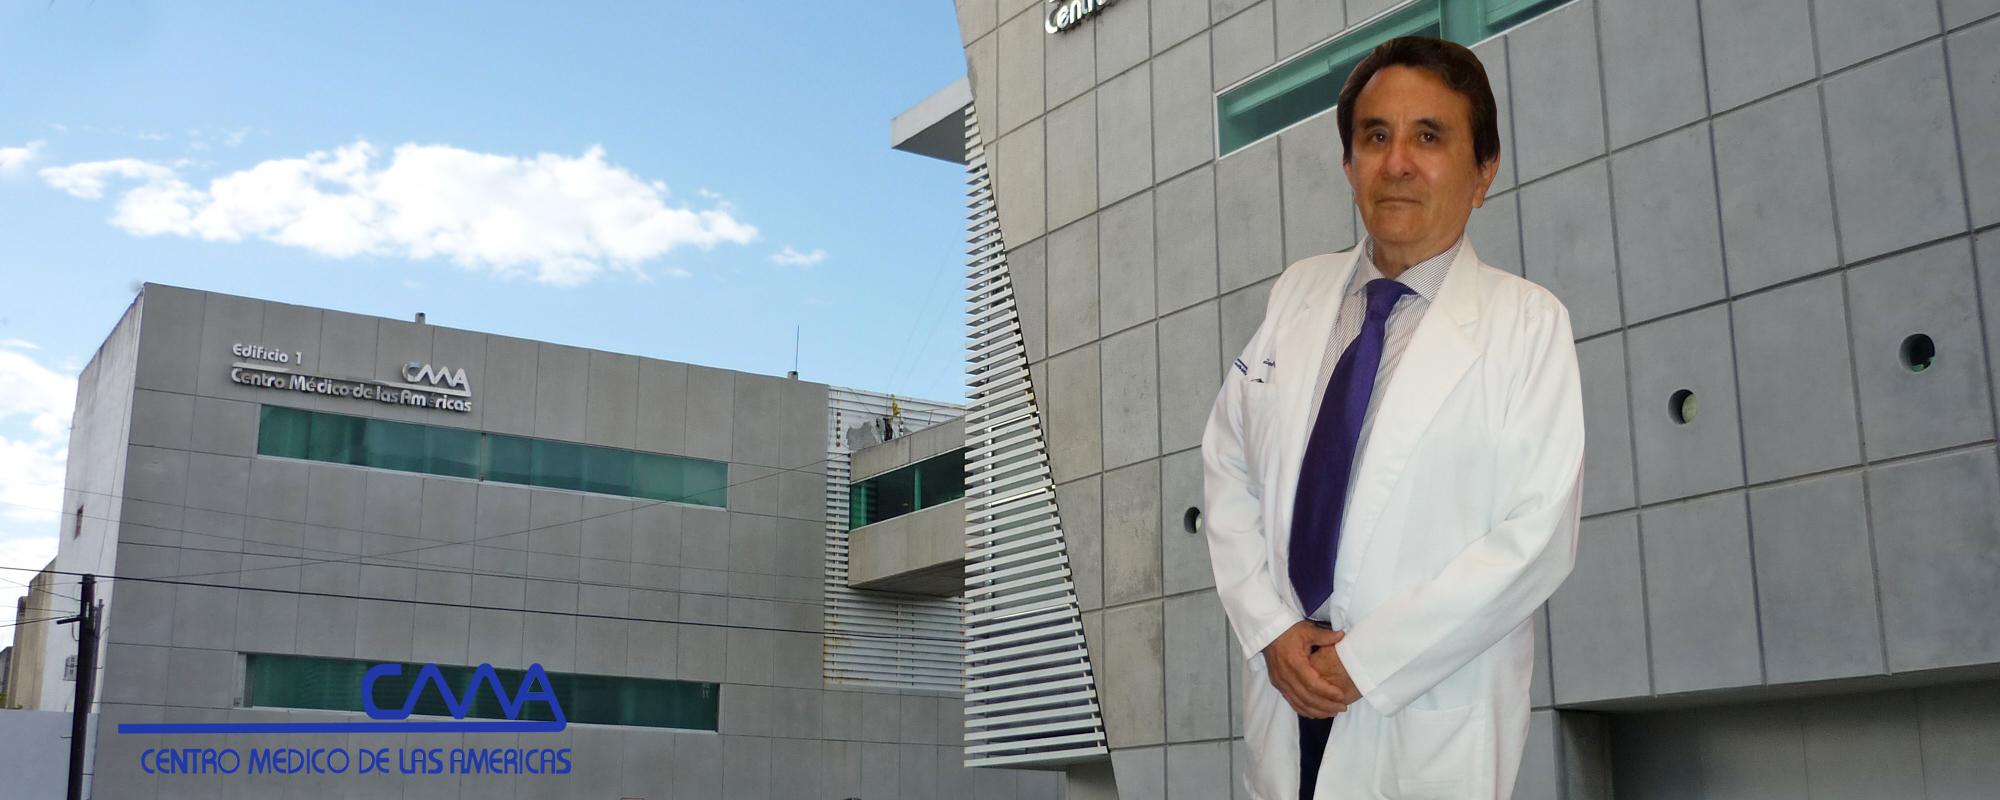 my-plastic-surgeon-in-mexico-slider-5